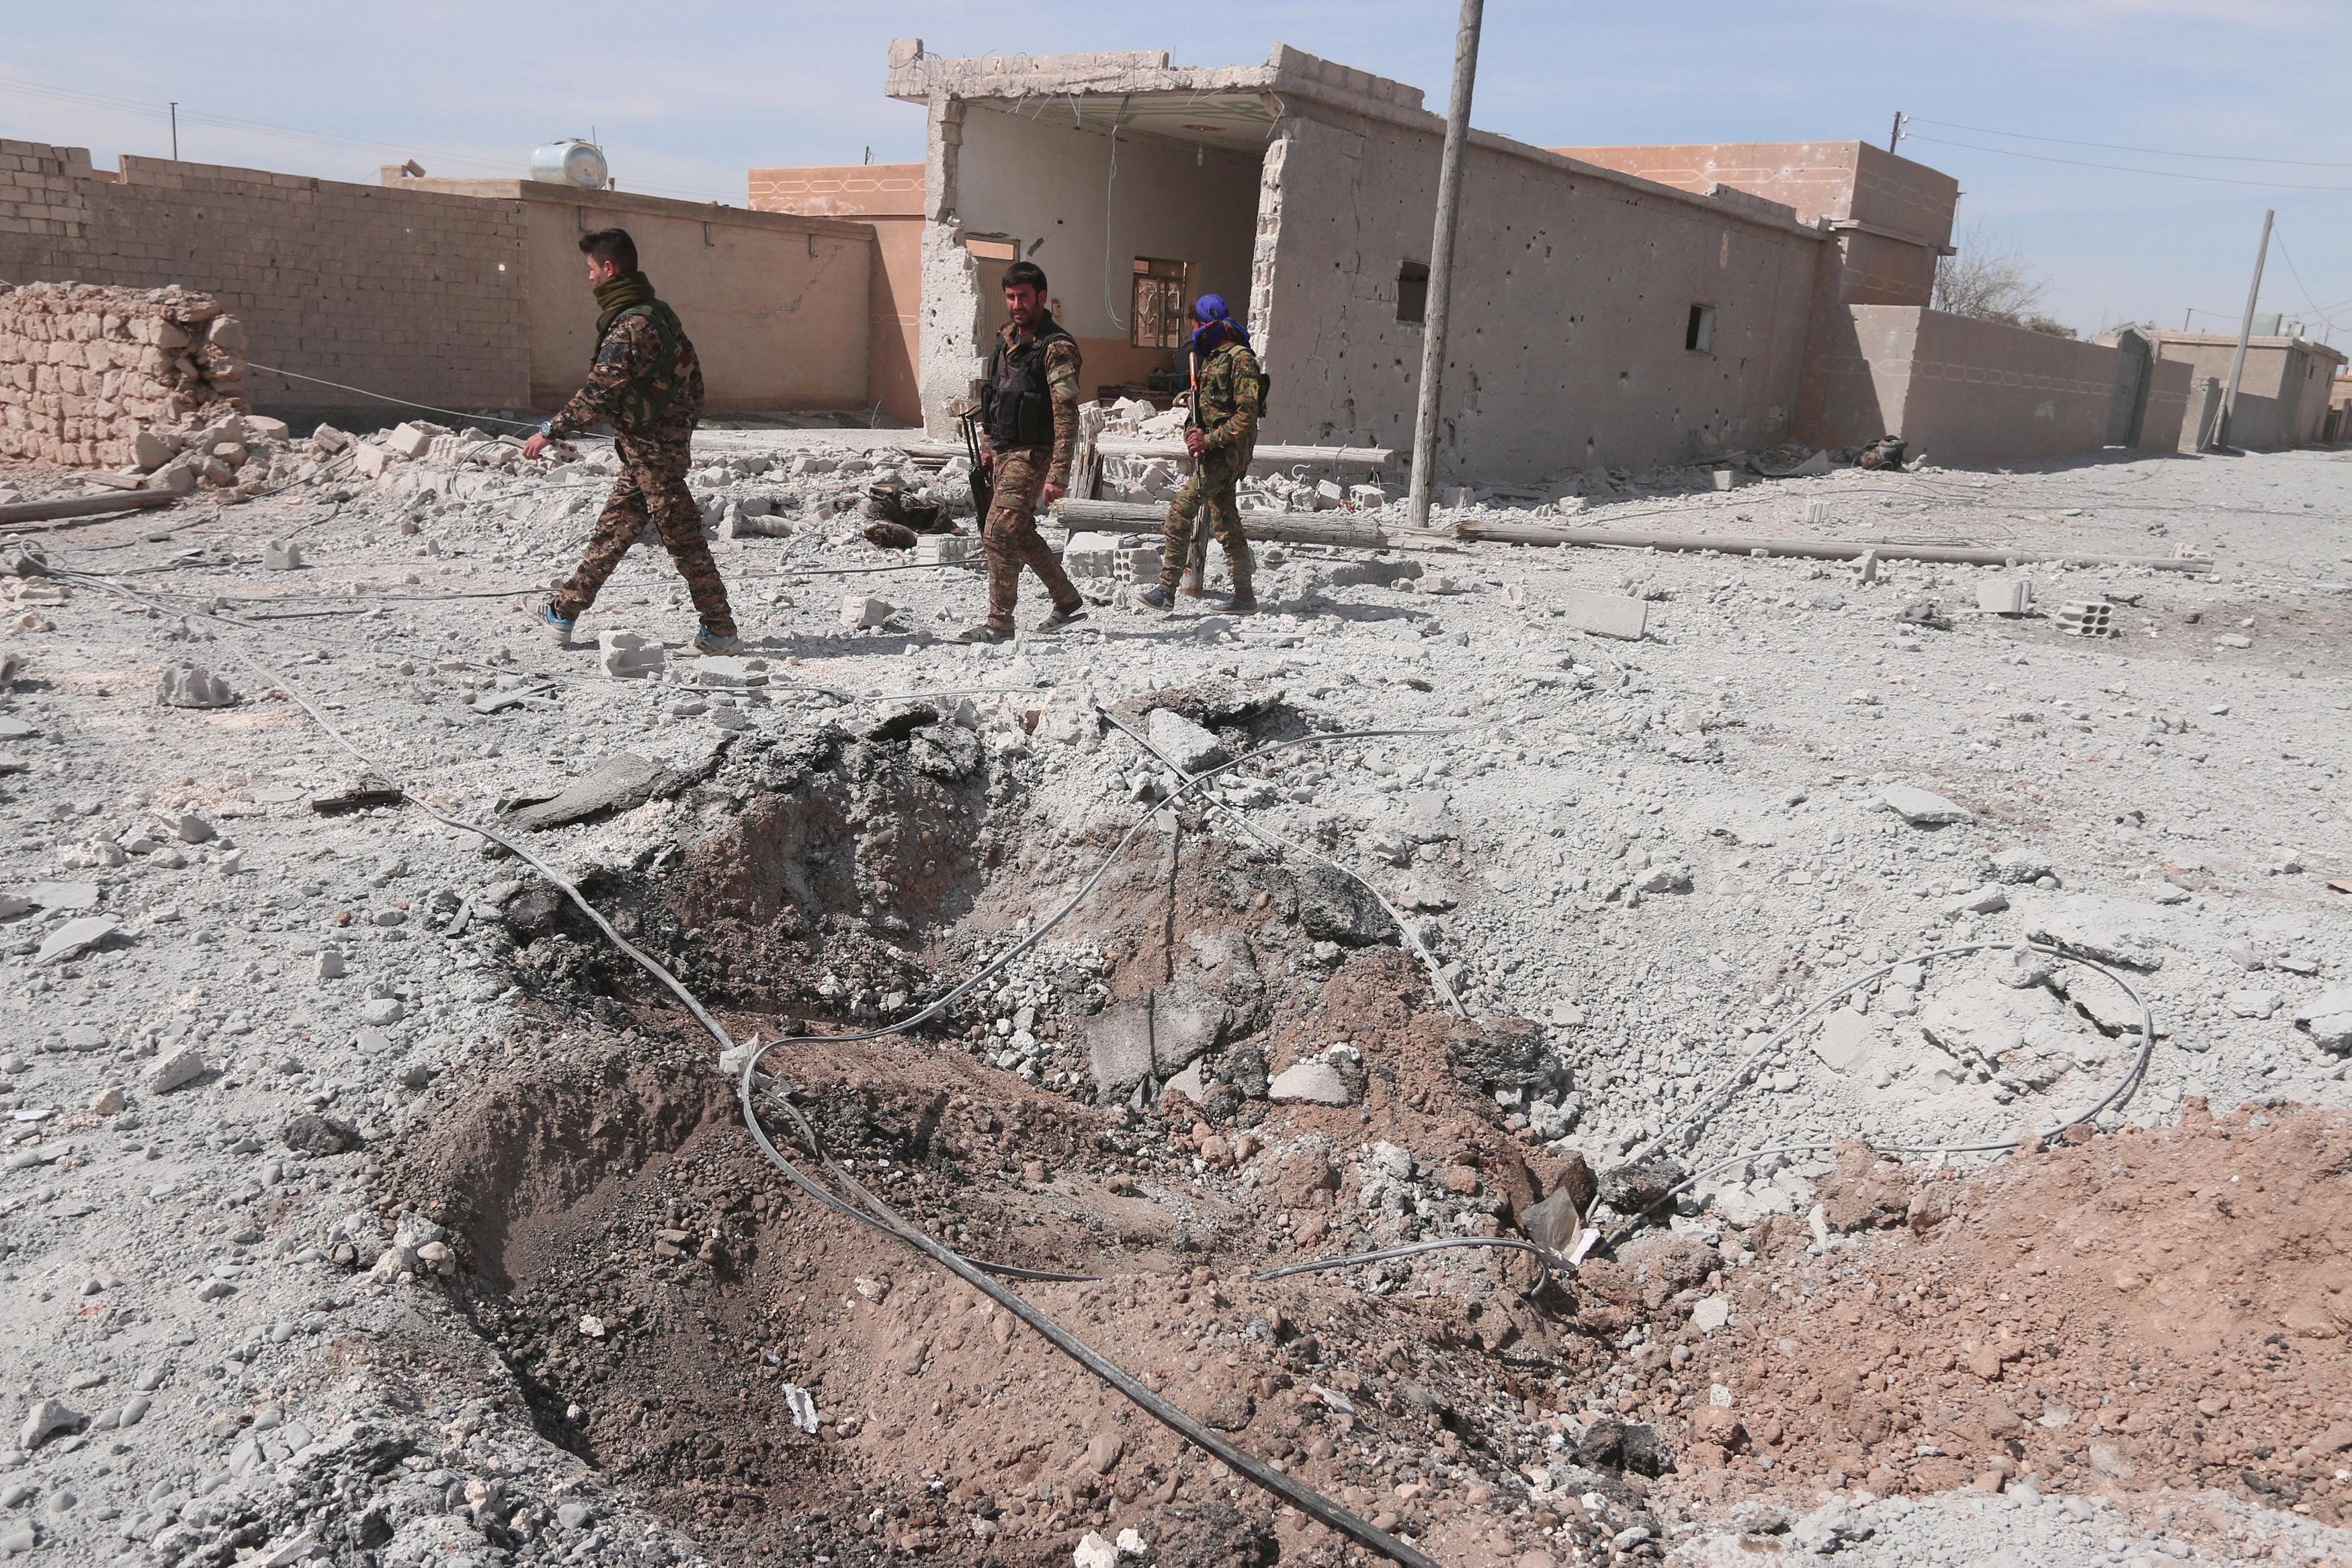 Syrian Democratic Forces (SDF) fighters walk near damaged ground east of Raqqa city, Syria.